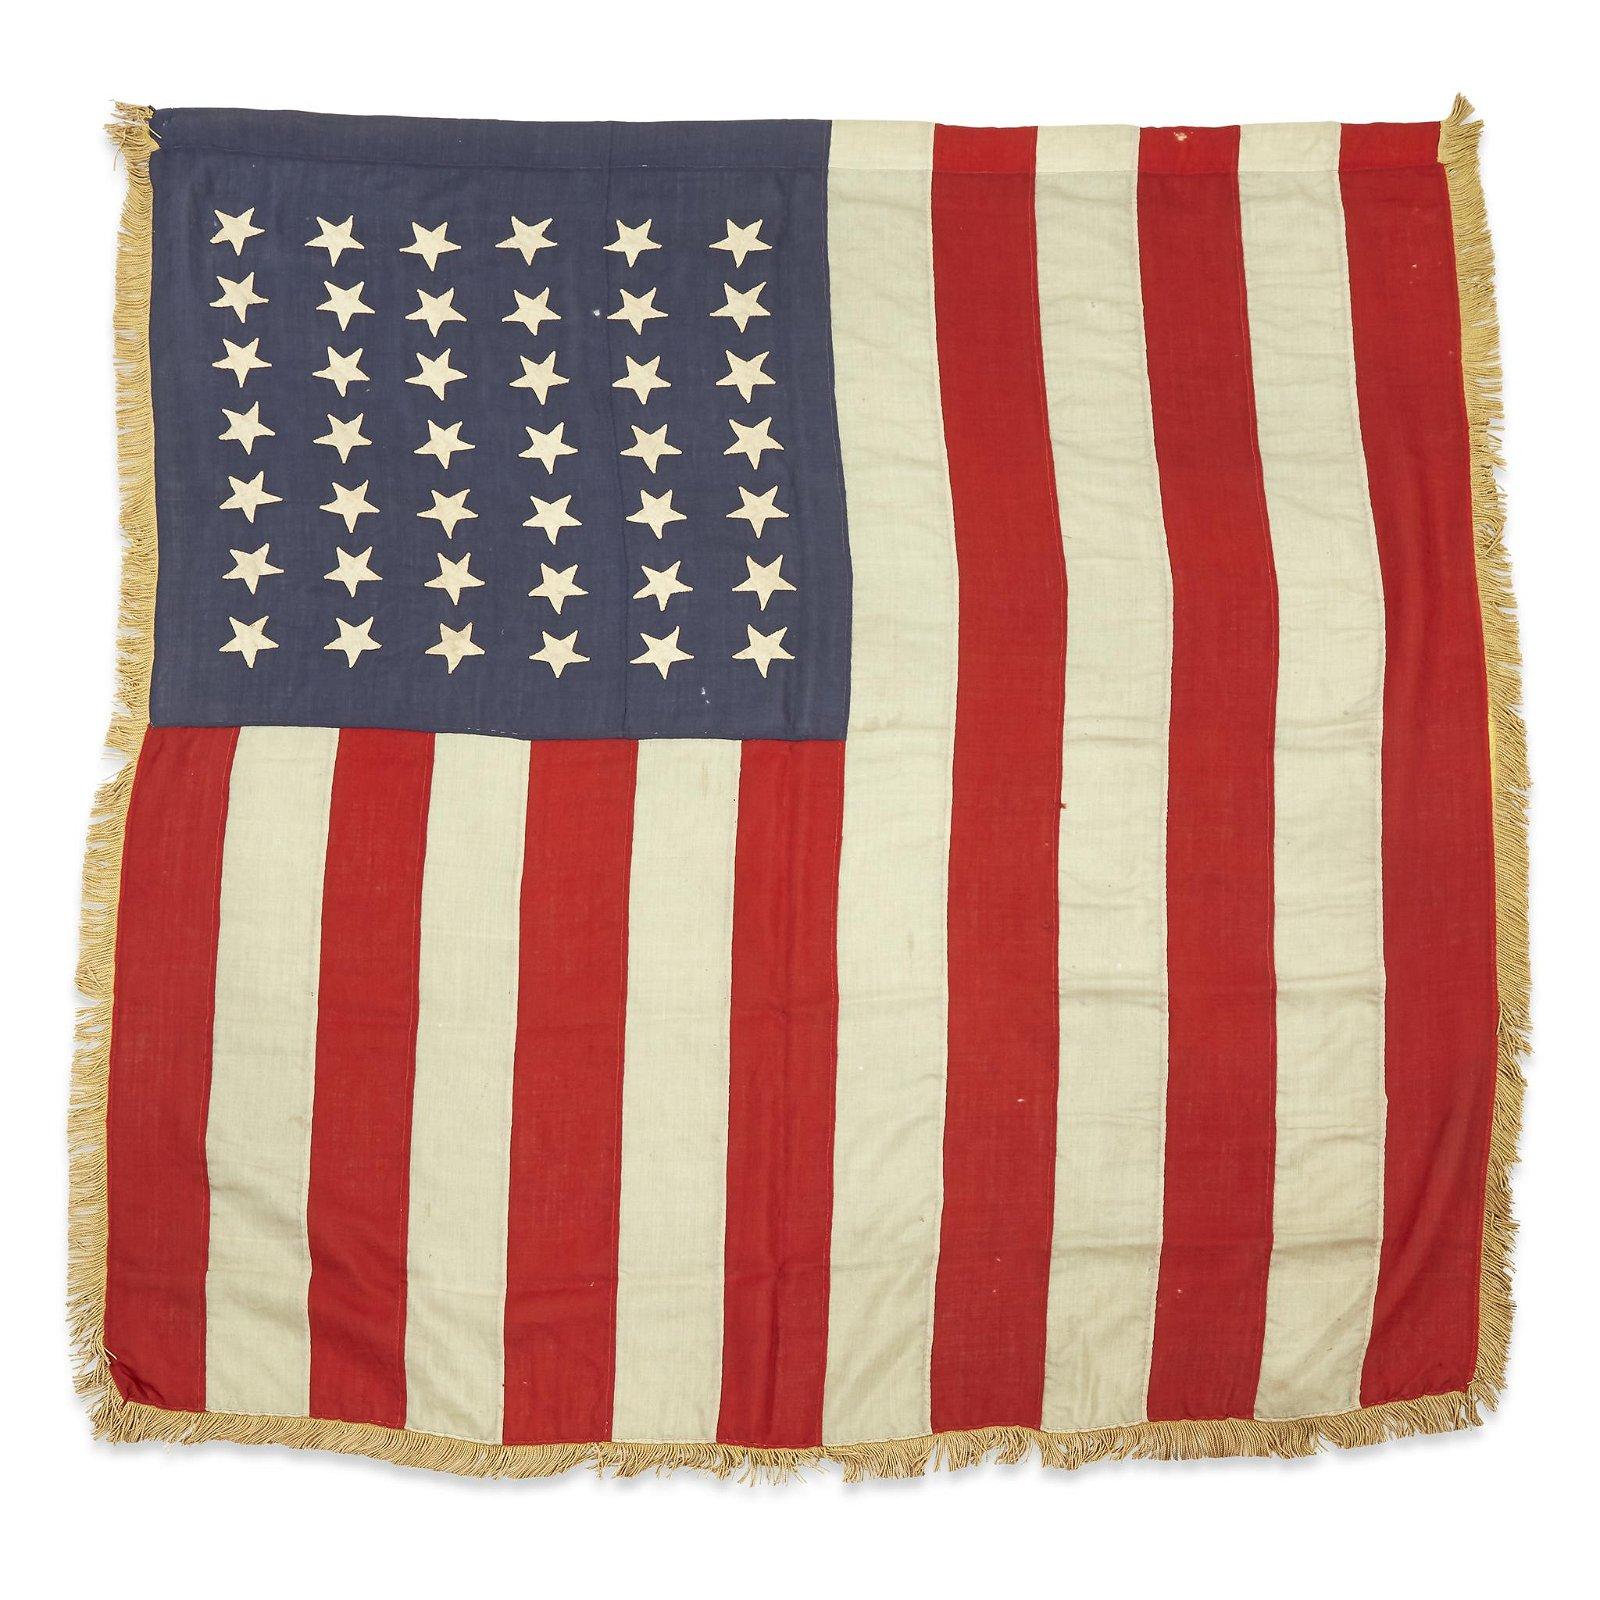 A 42-Star American Flag commemorating Washington